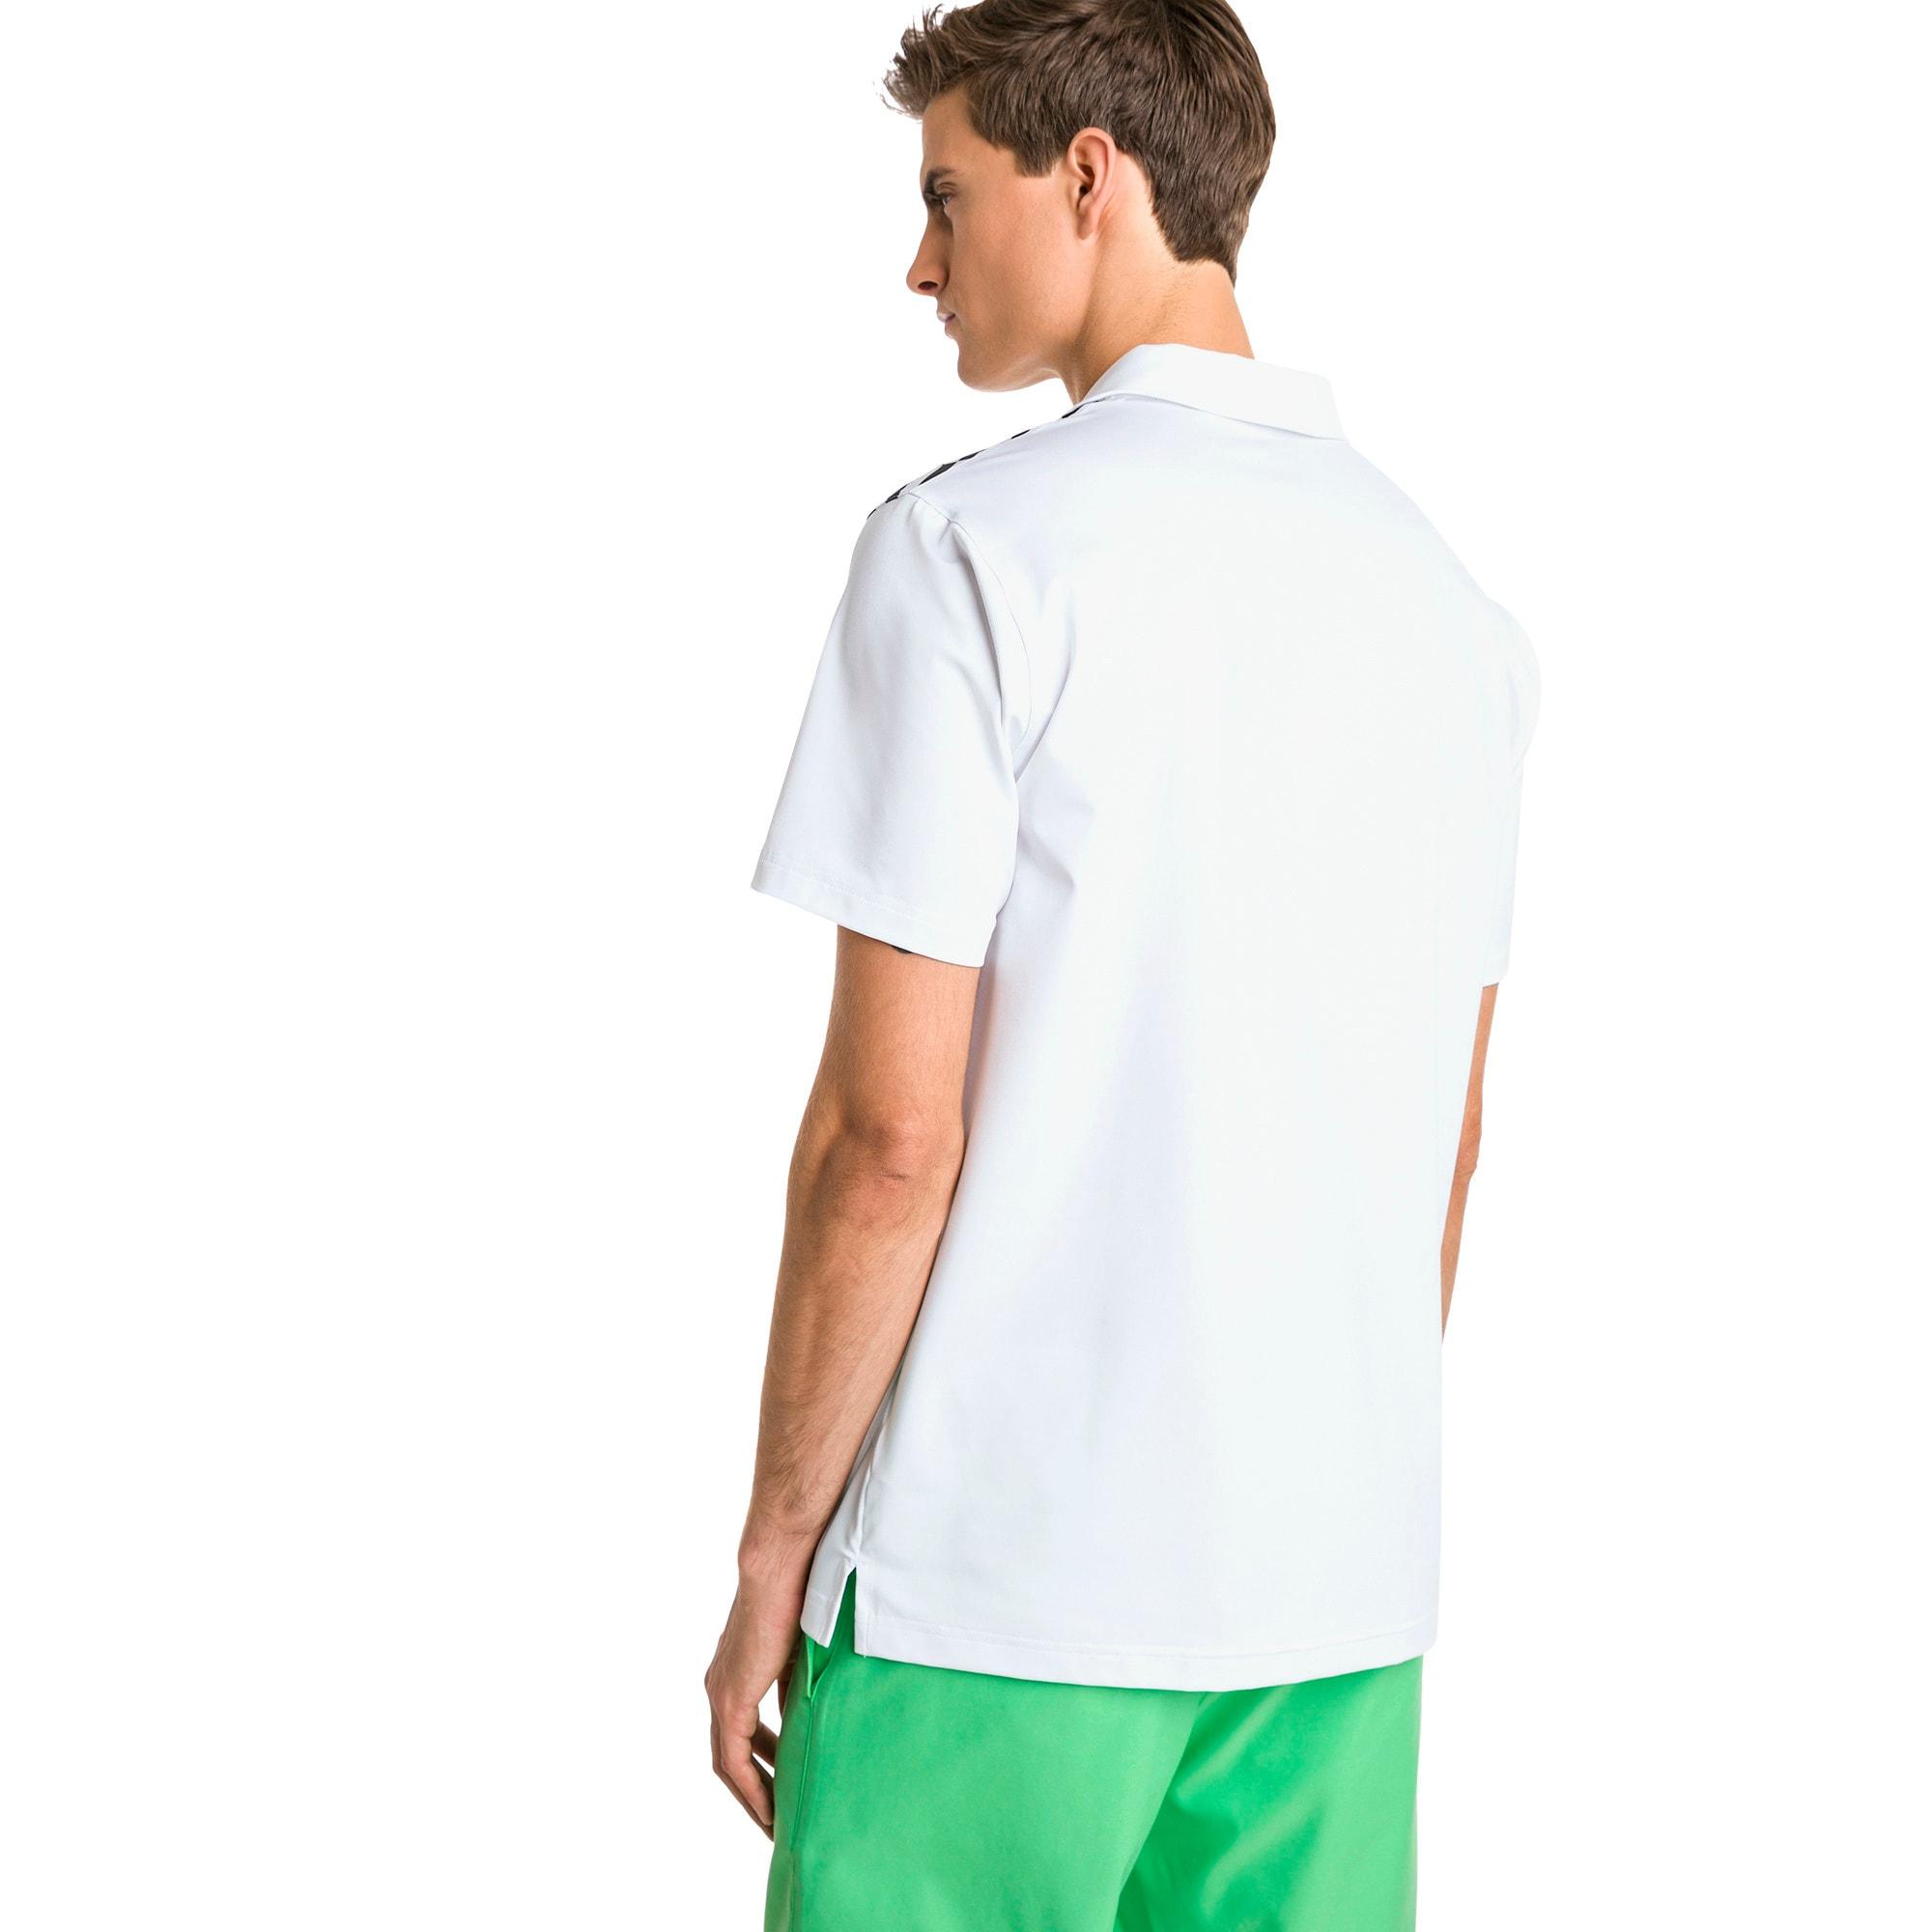 Thumbnail 2 of Polo de golf Road Map pour homme, Bright White-Irish Green, medium